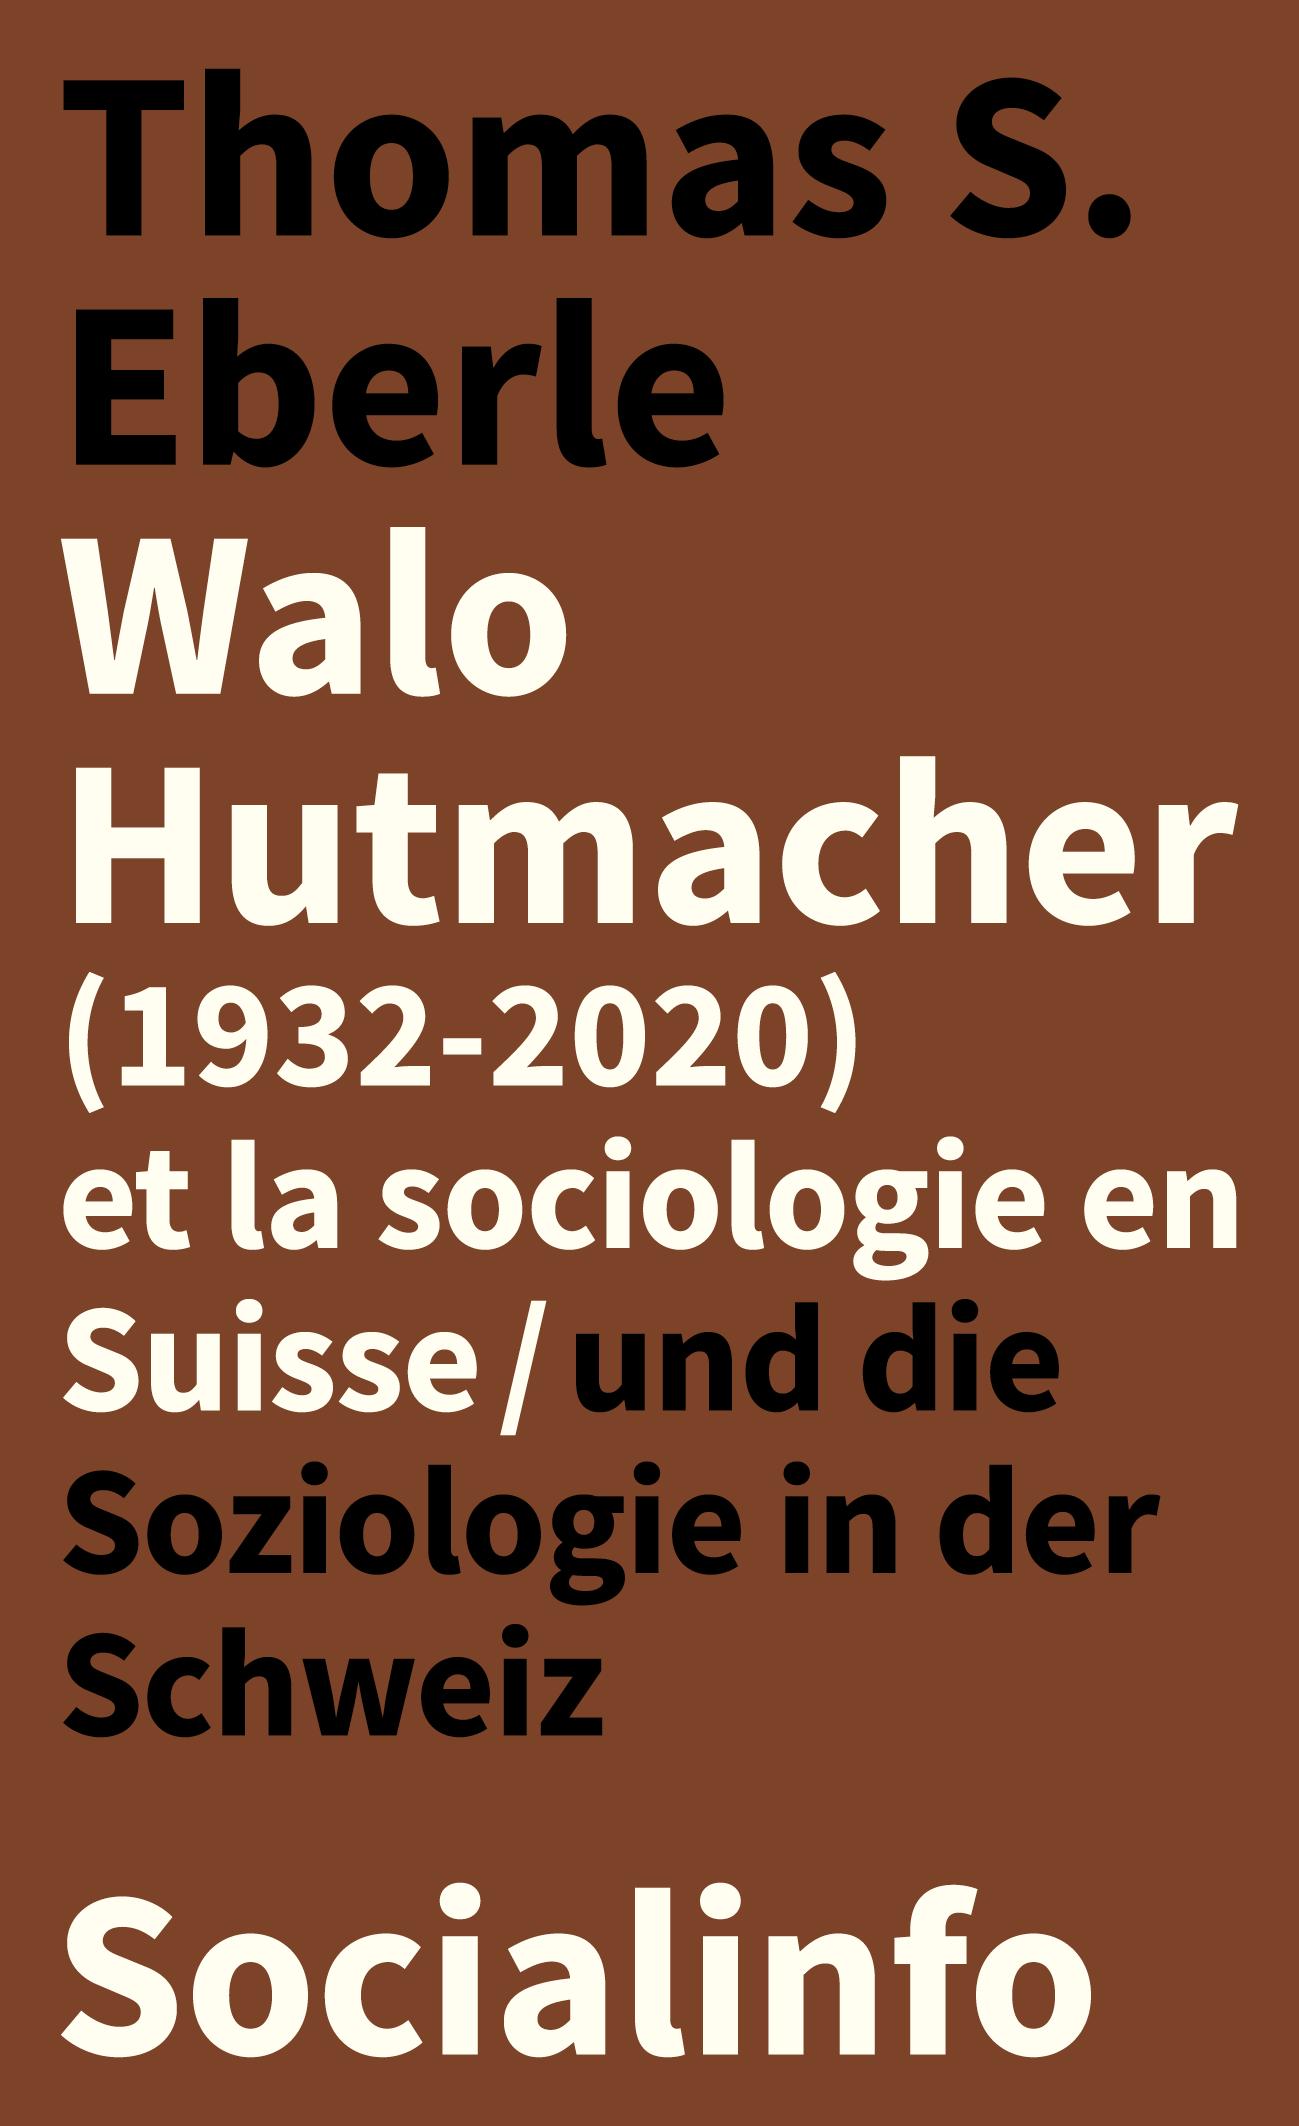 Walo Hutmacher